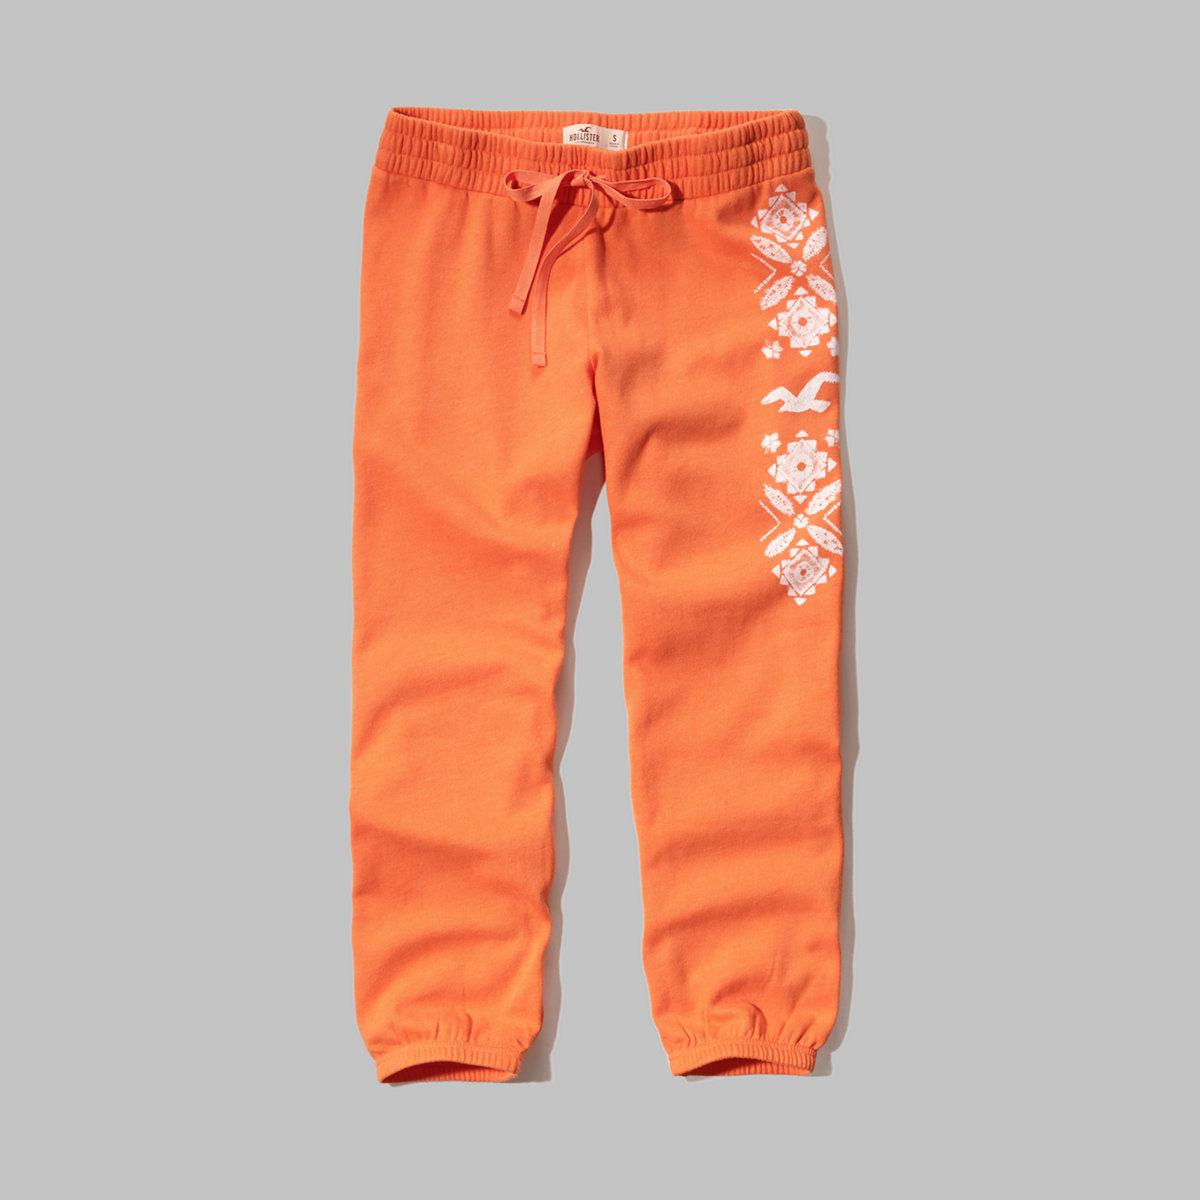 Hollister Banded Crop Sweatpants